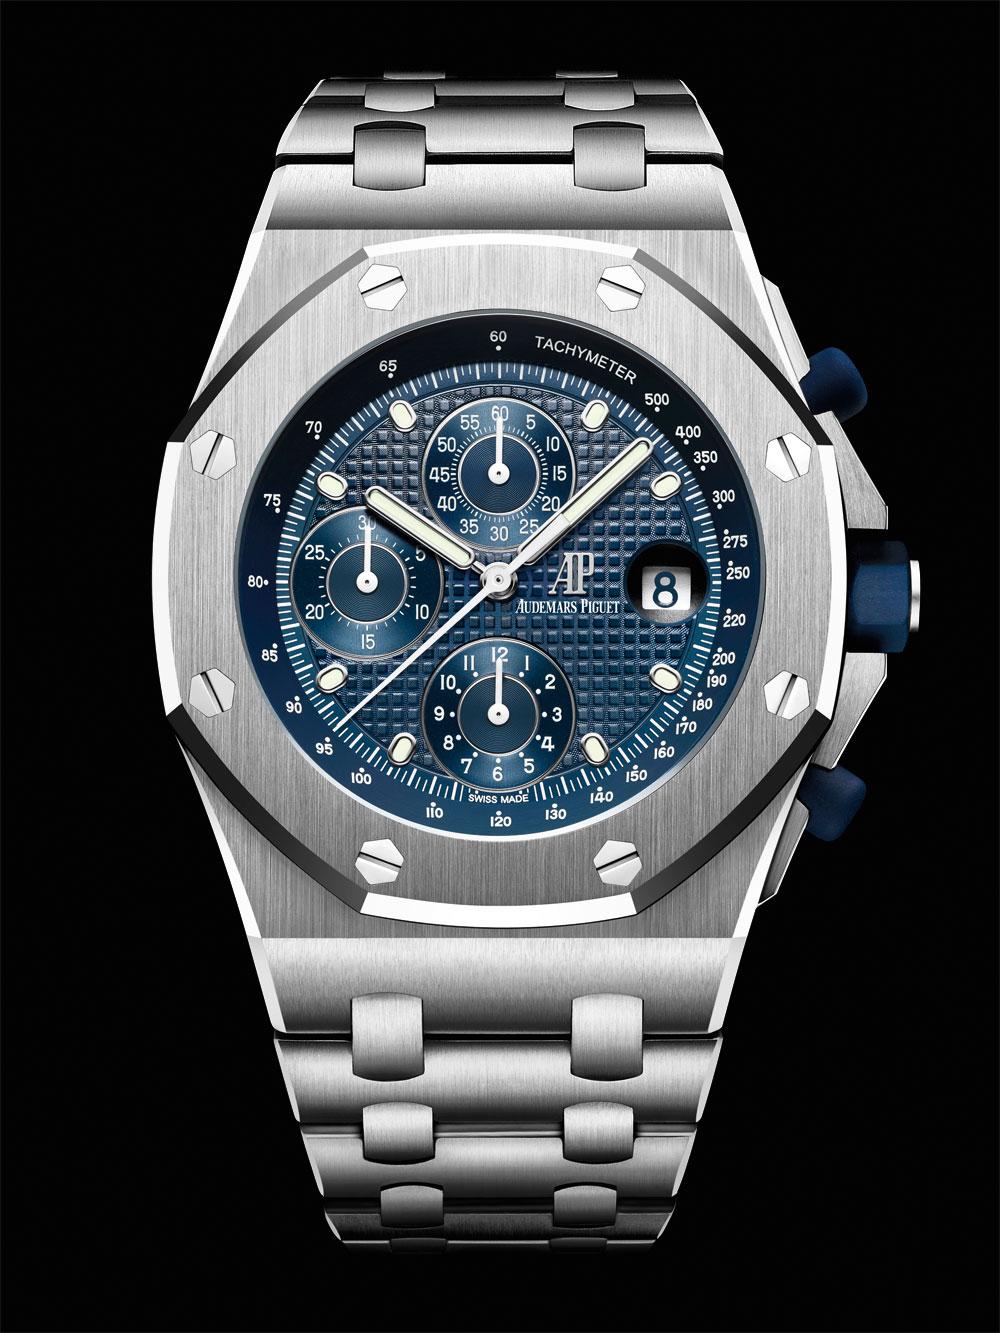 Reloj Audemars Piguet Royal Oak Offshore Selfwinding Chronograph